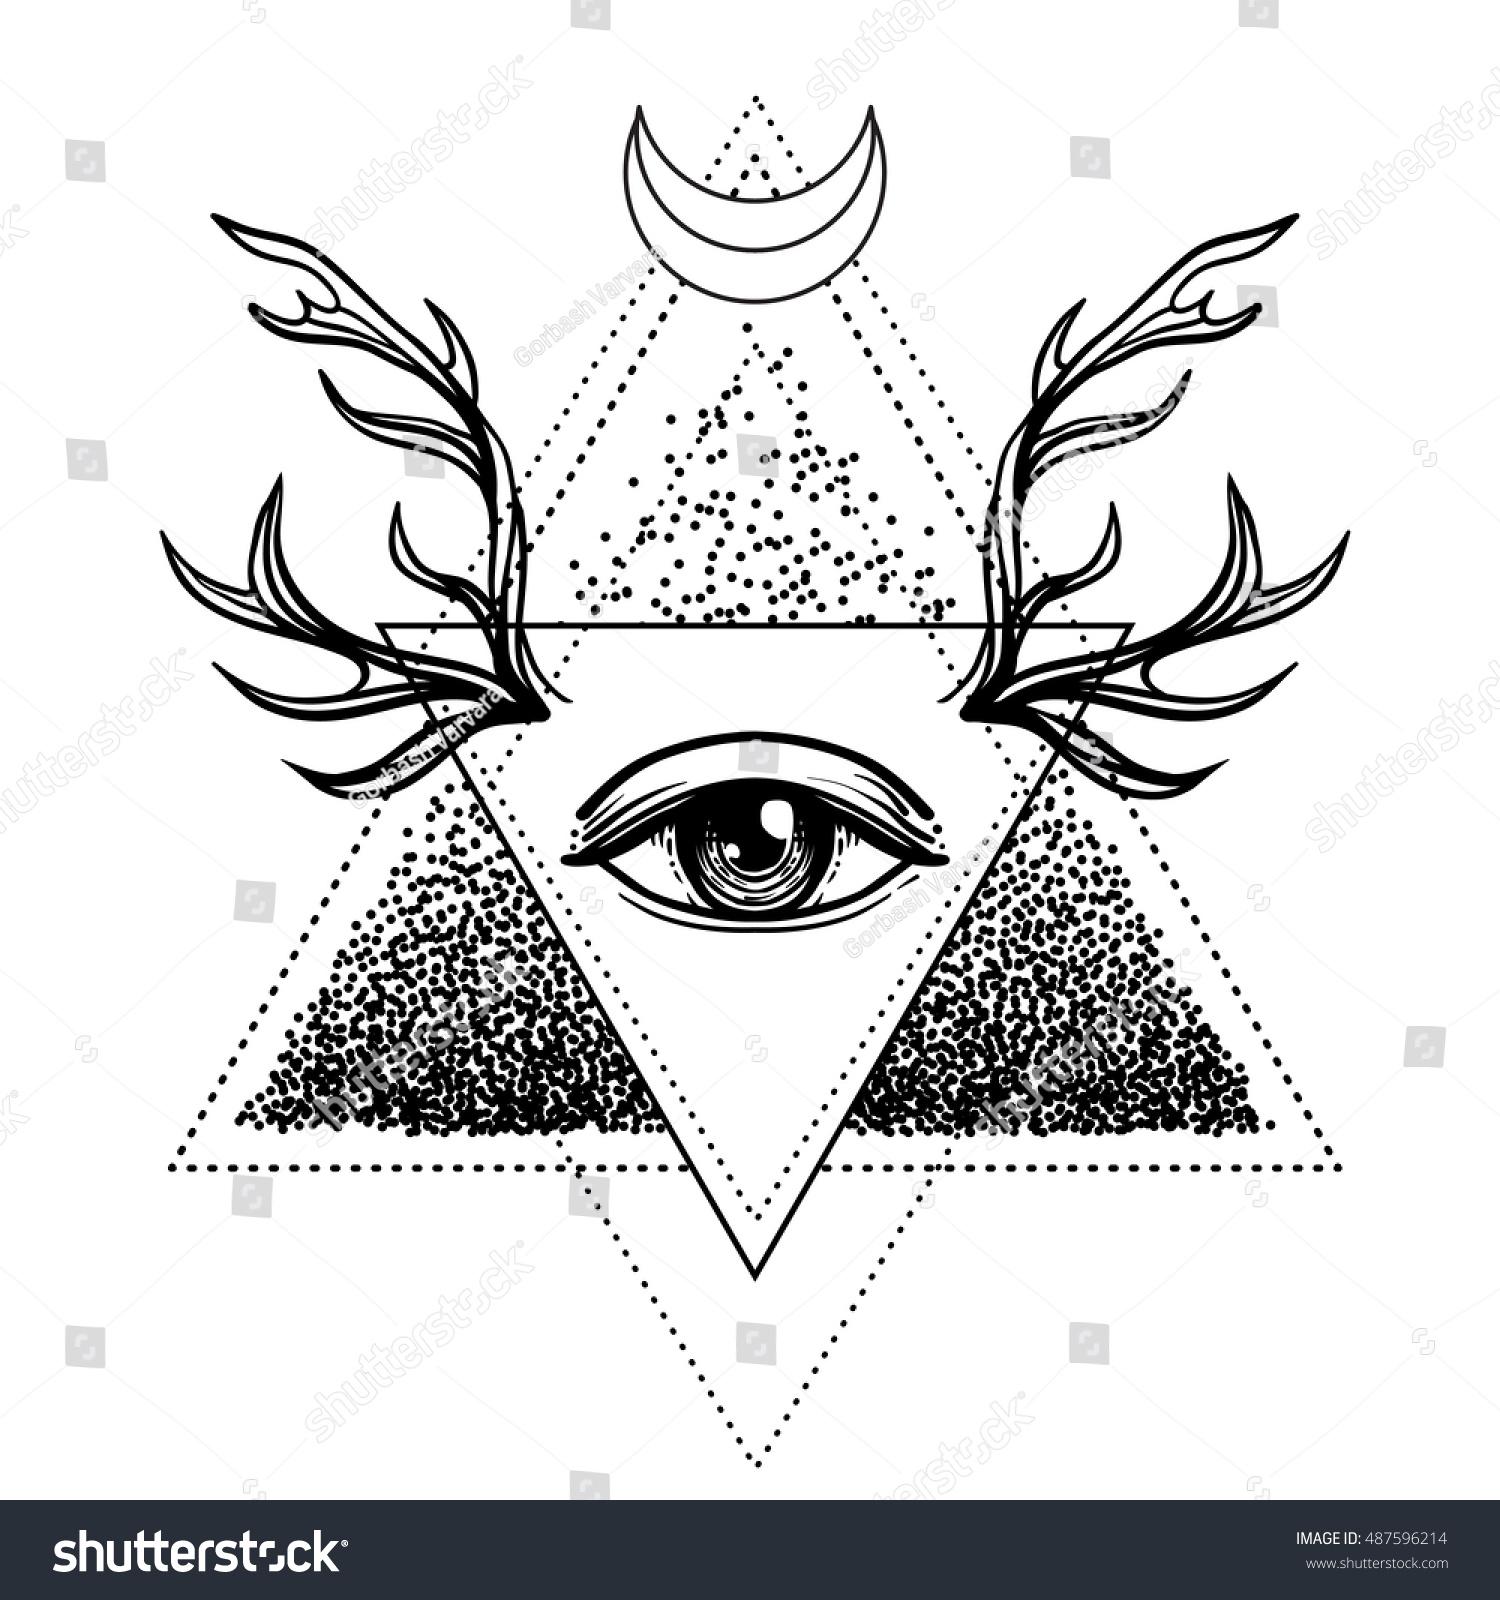 Allseeing eye symbol blackwork tattoo design stock vector all seeing eye symbol blackwork tattoo design sacred geometry third eye biocorpaavc Choice Image